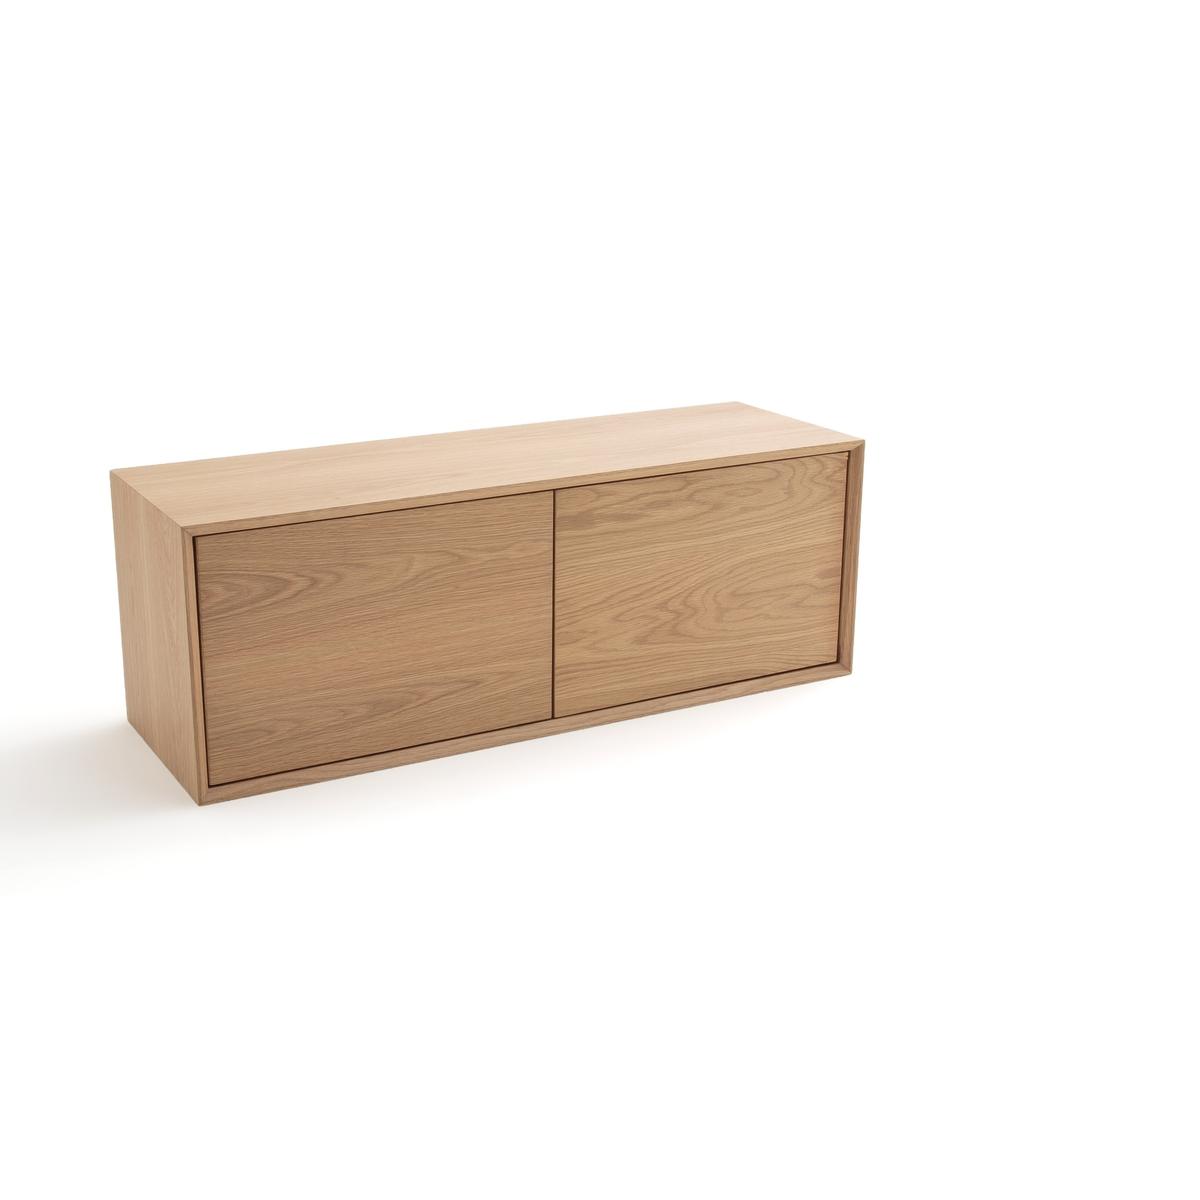 Ящик из дуба Д110 см Archivita этажерка l110 x p28 см из орехового дерева archivita